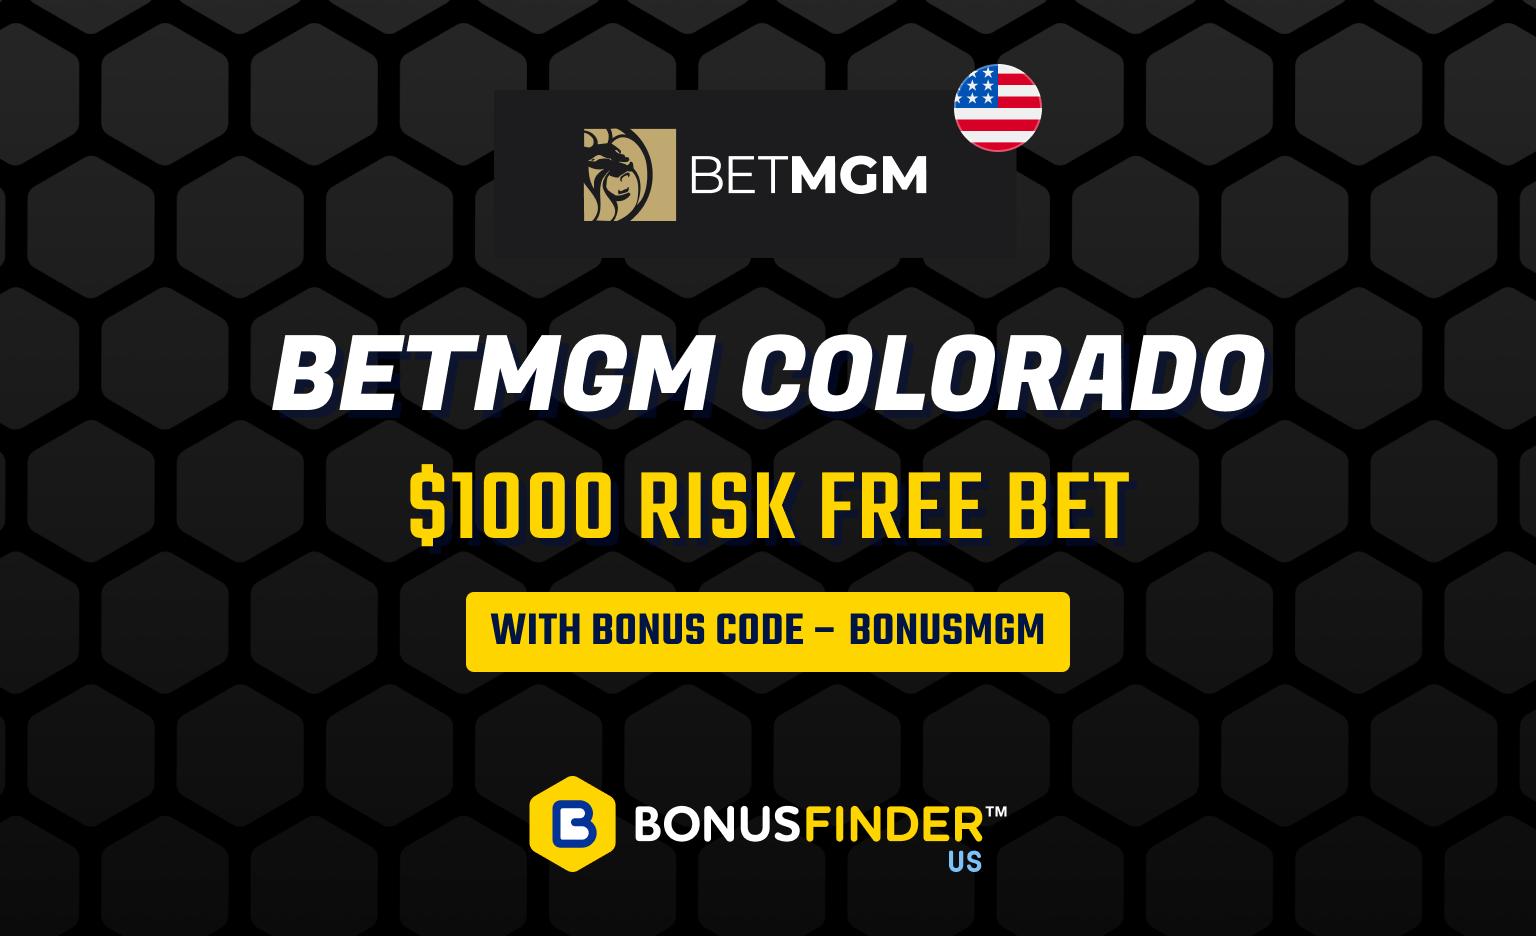 BetMGM Colorado